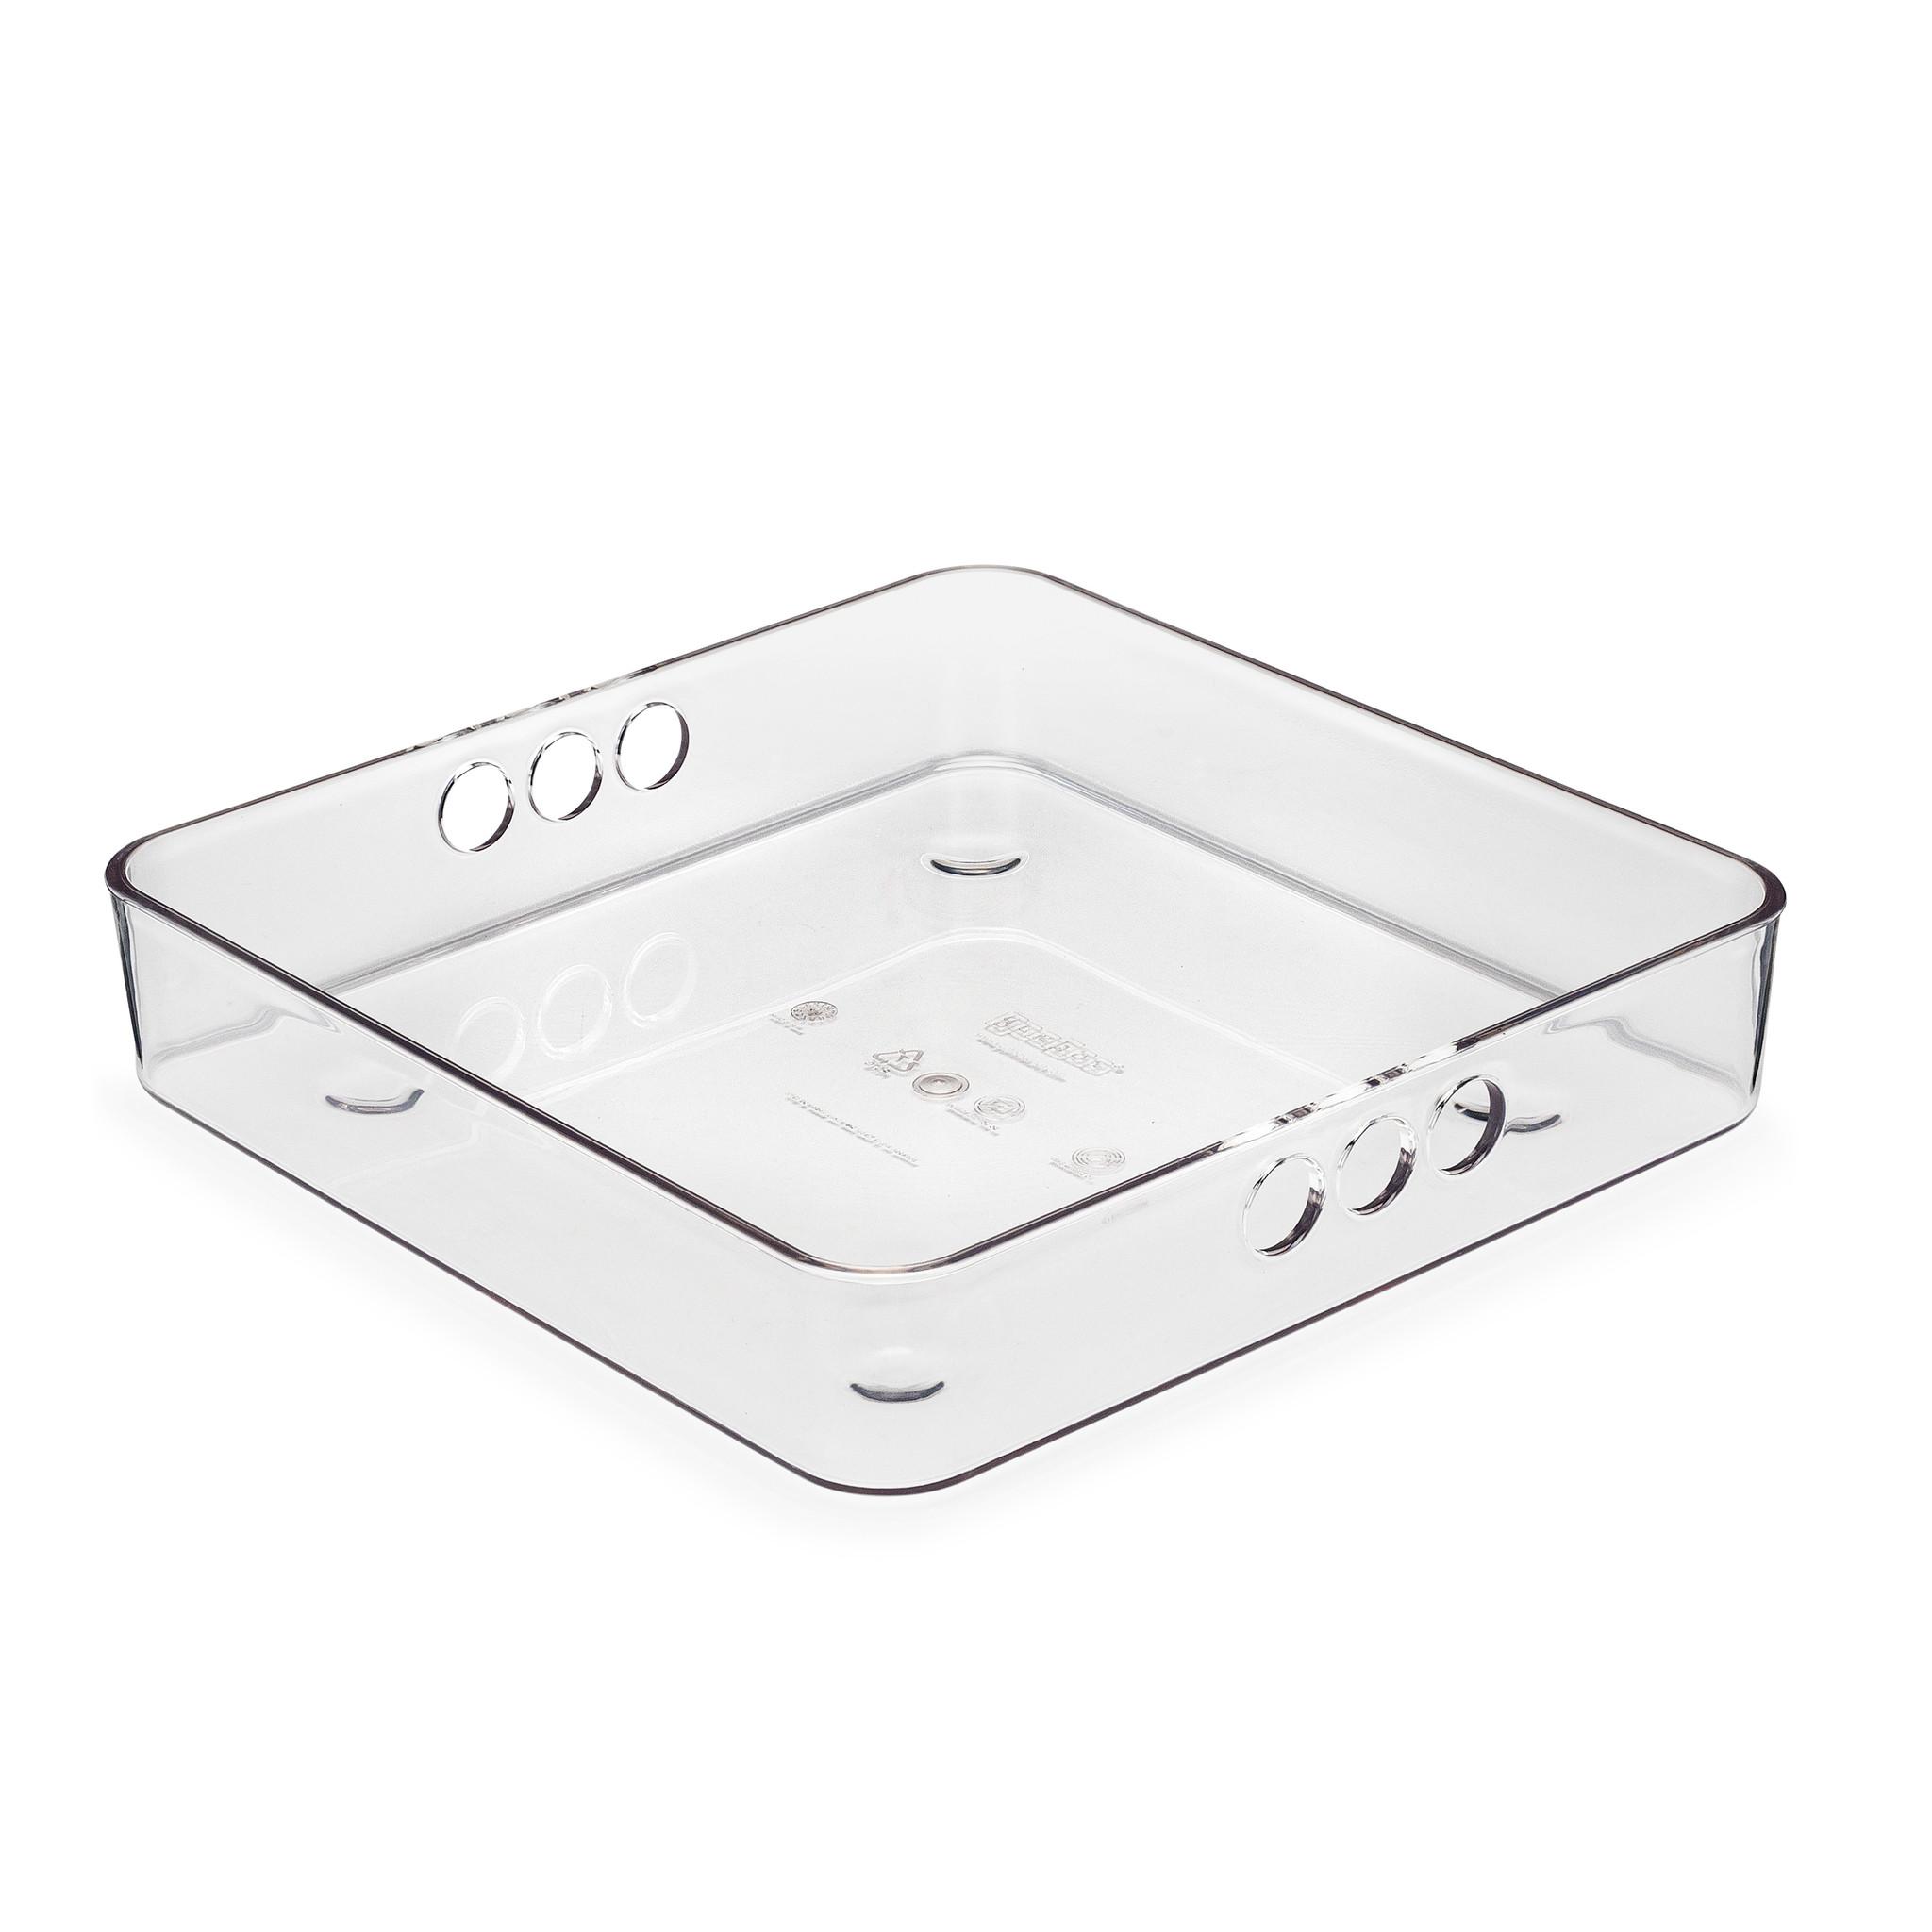 Yumbox Chop Chop tray, vierkant-1